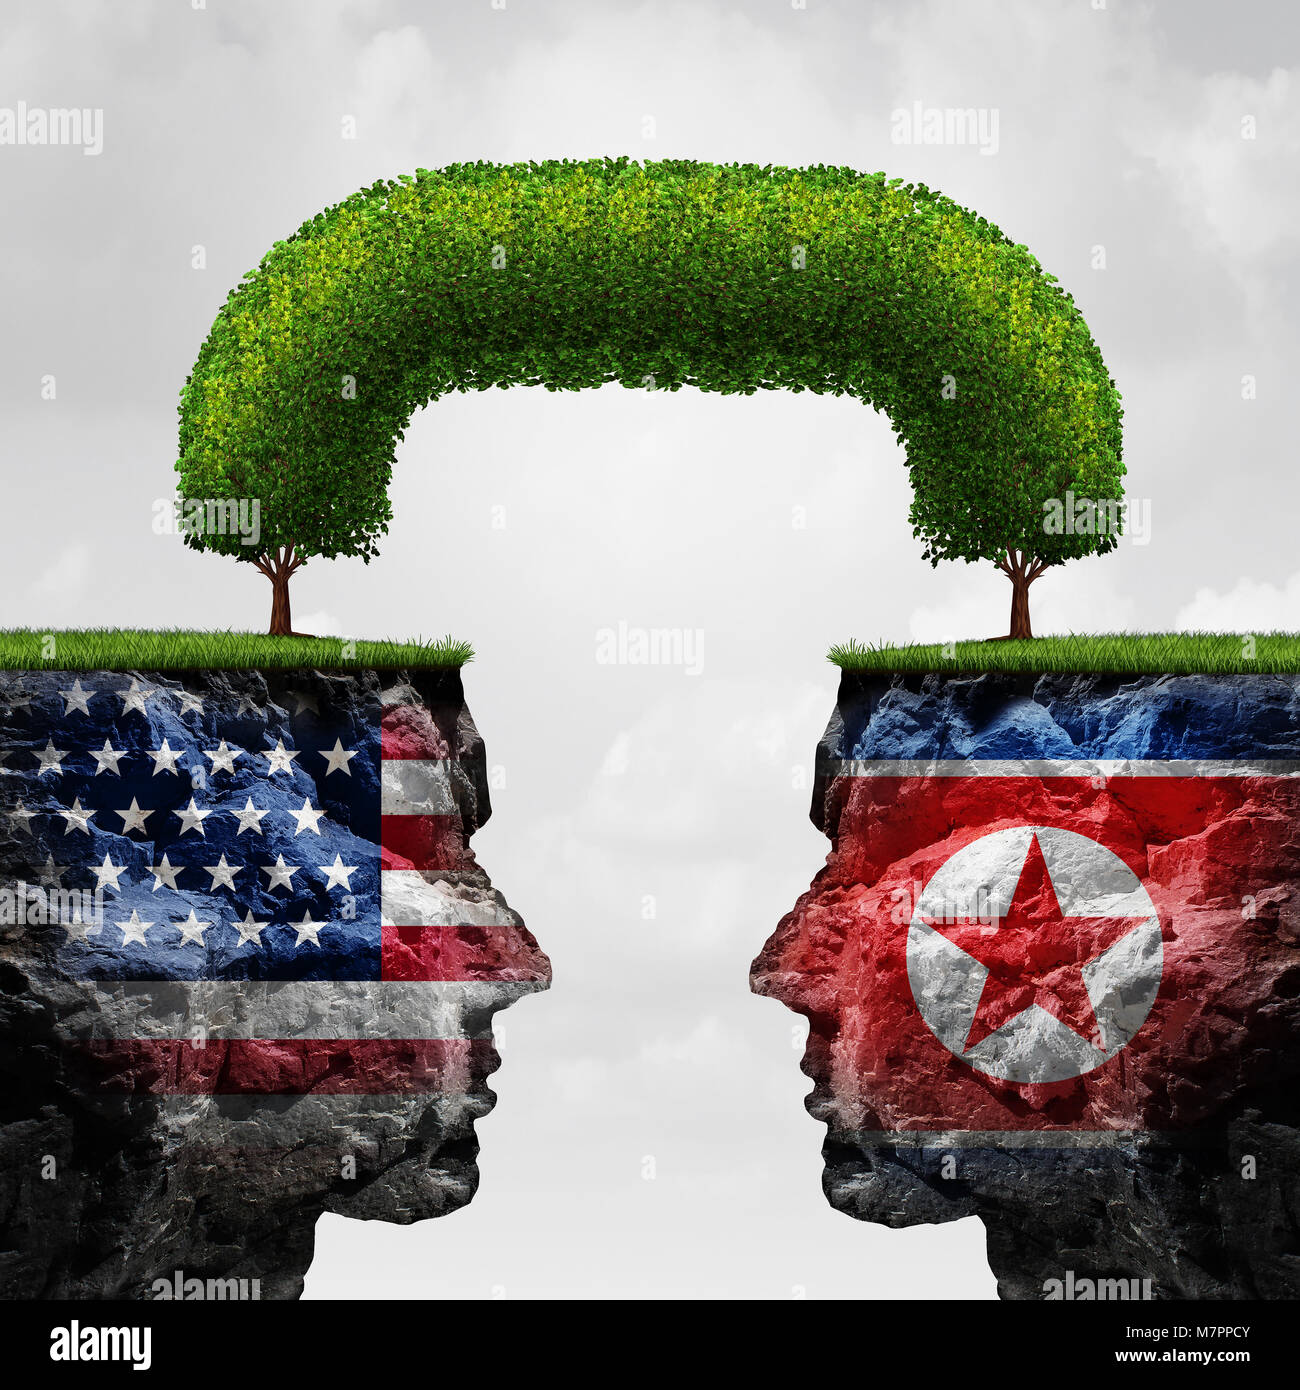 American and North Korea agreement and diplomacy between pyongyang and washington as an asian crisis negotiation - Stock Image